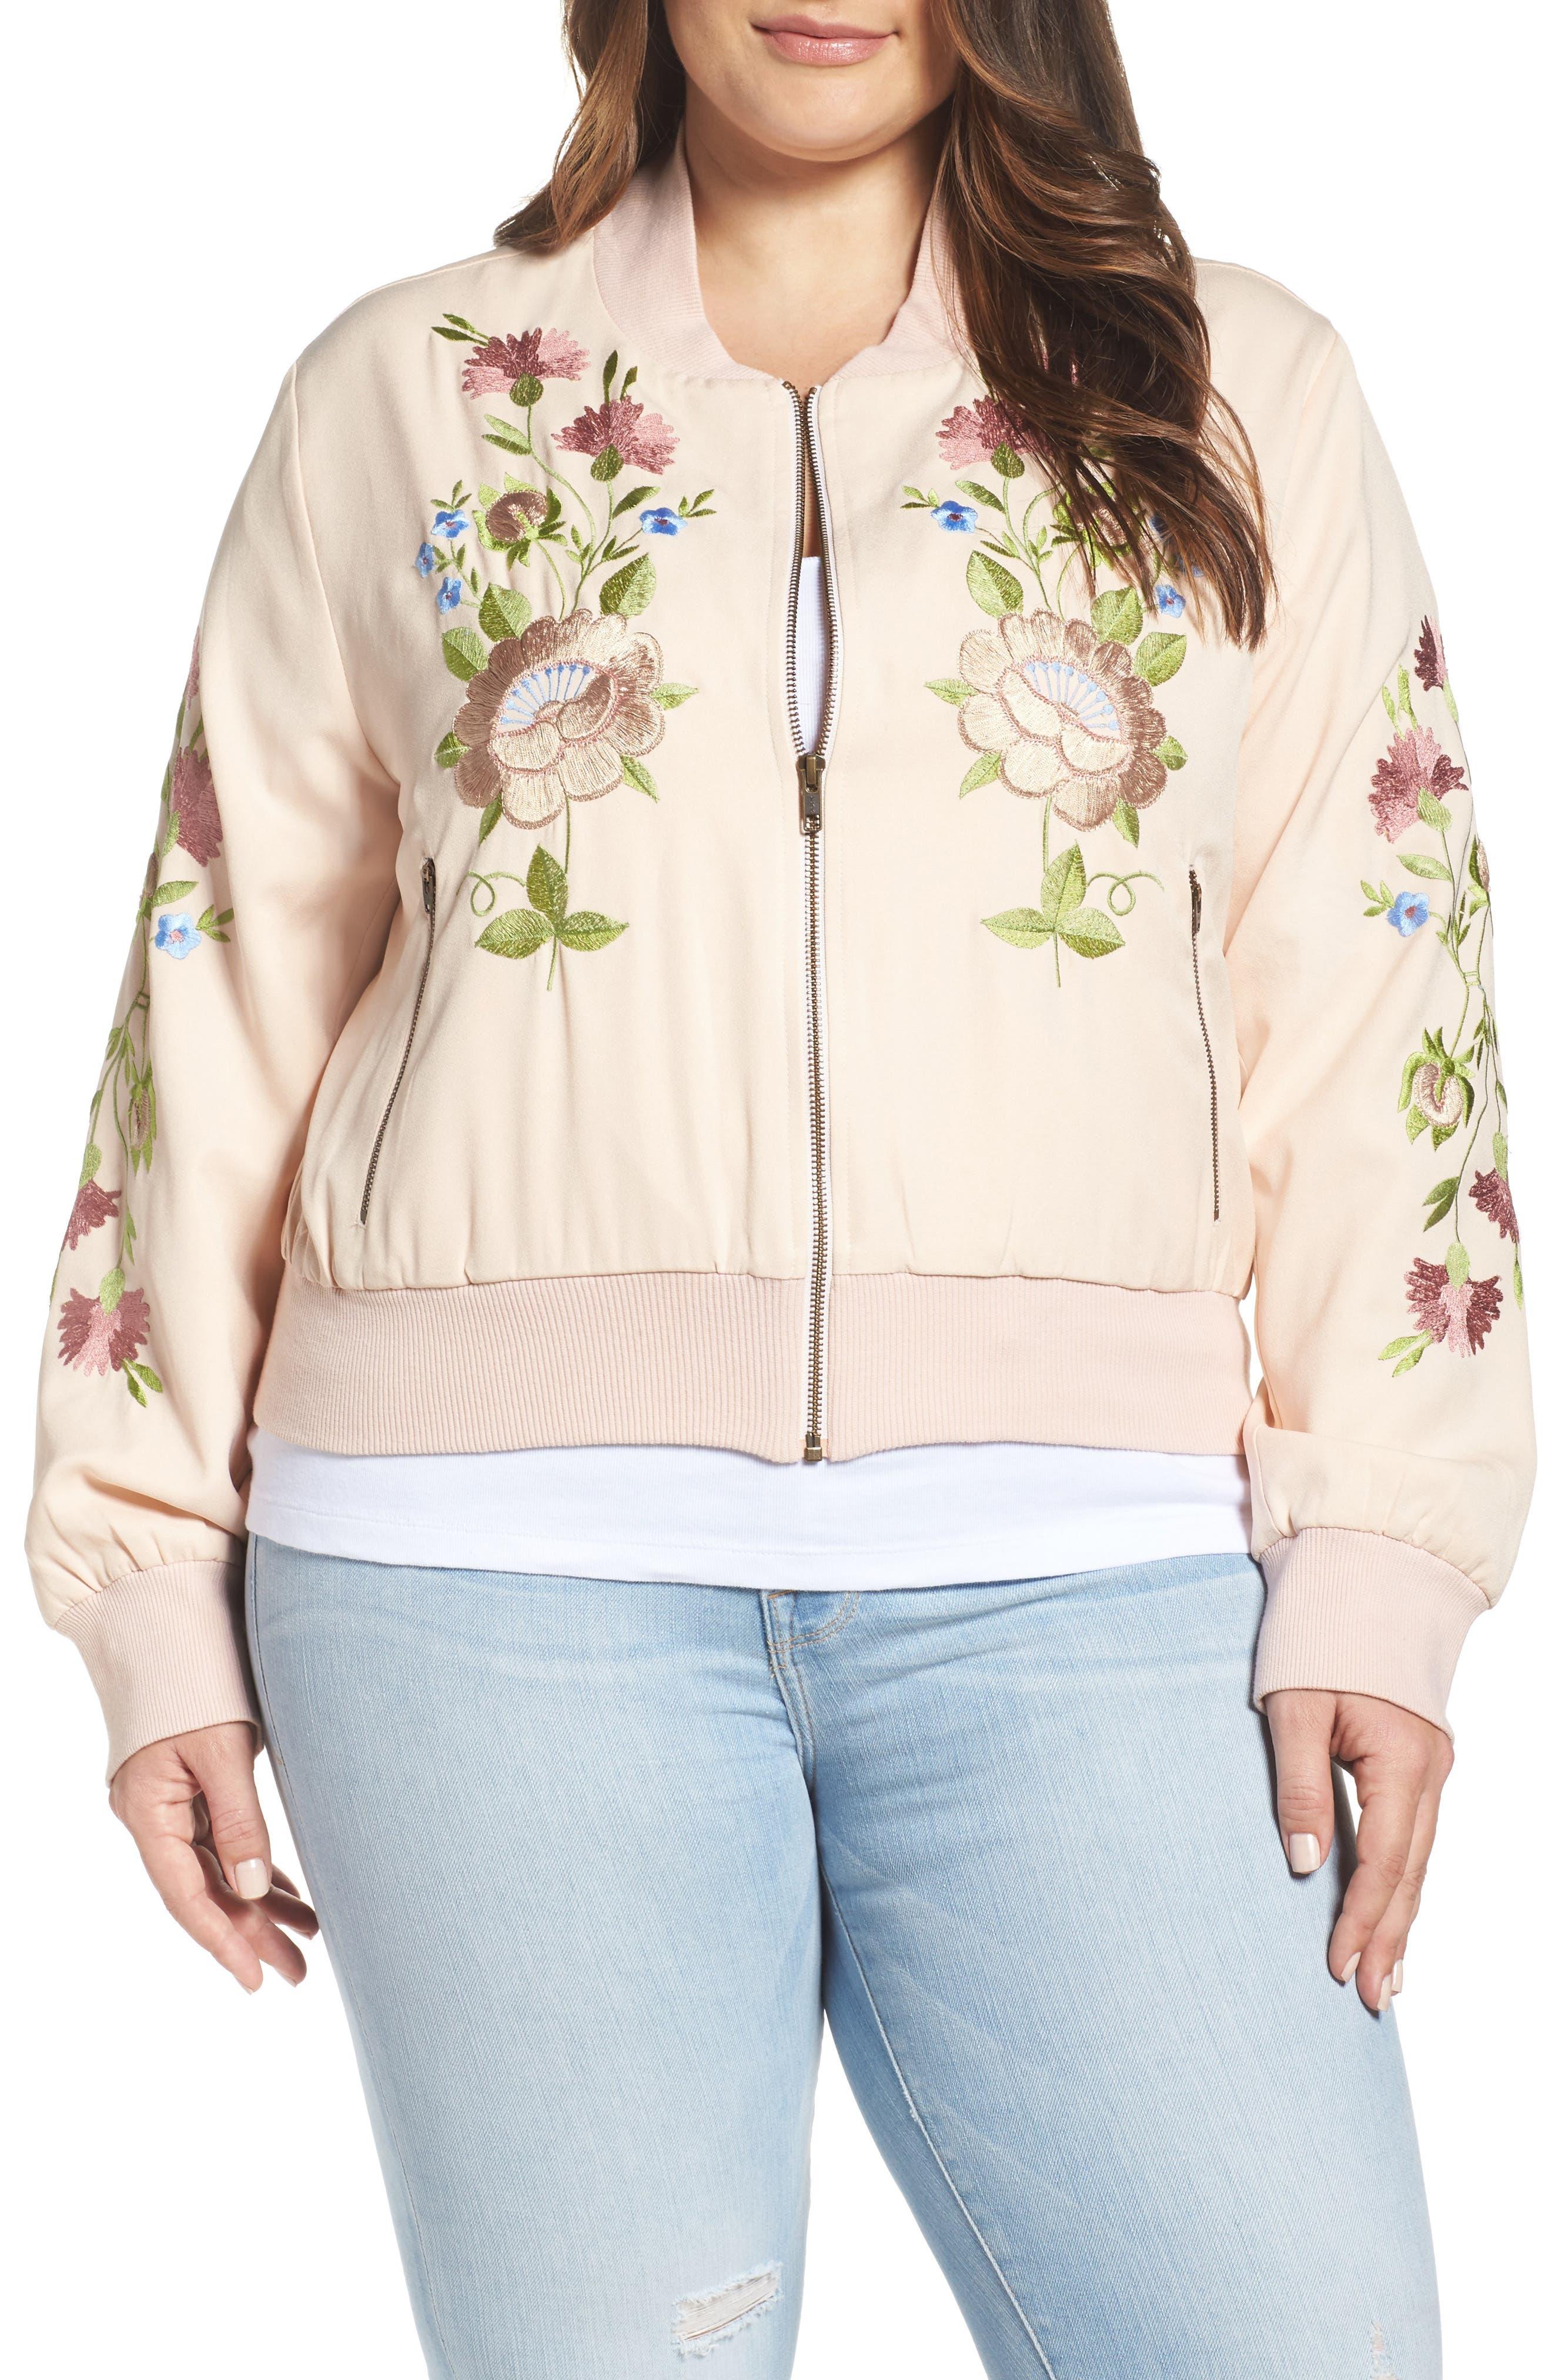 Main Image - Glamorous Floral Embroidered Bomber Jacket (Plus Size)